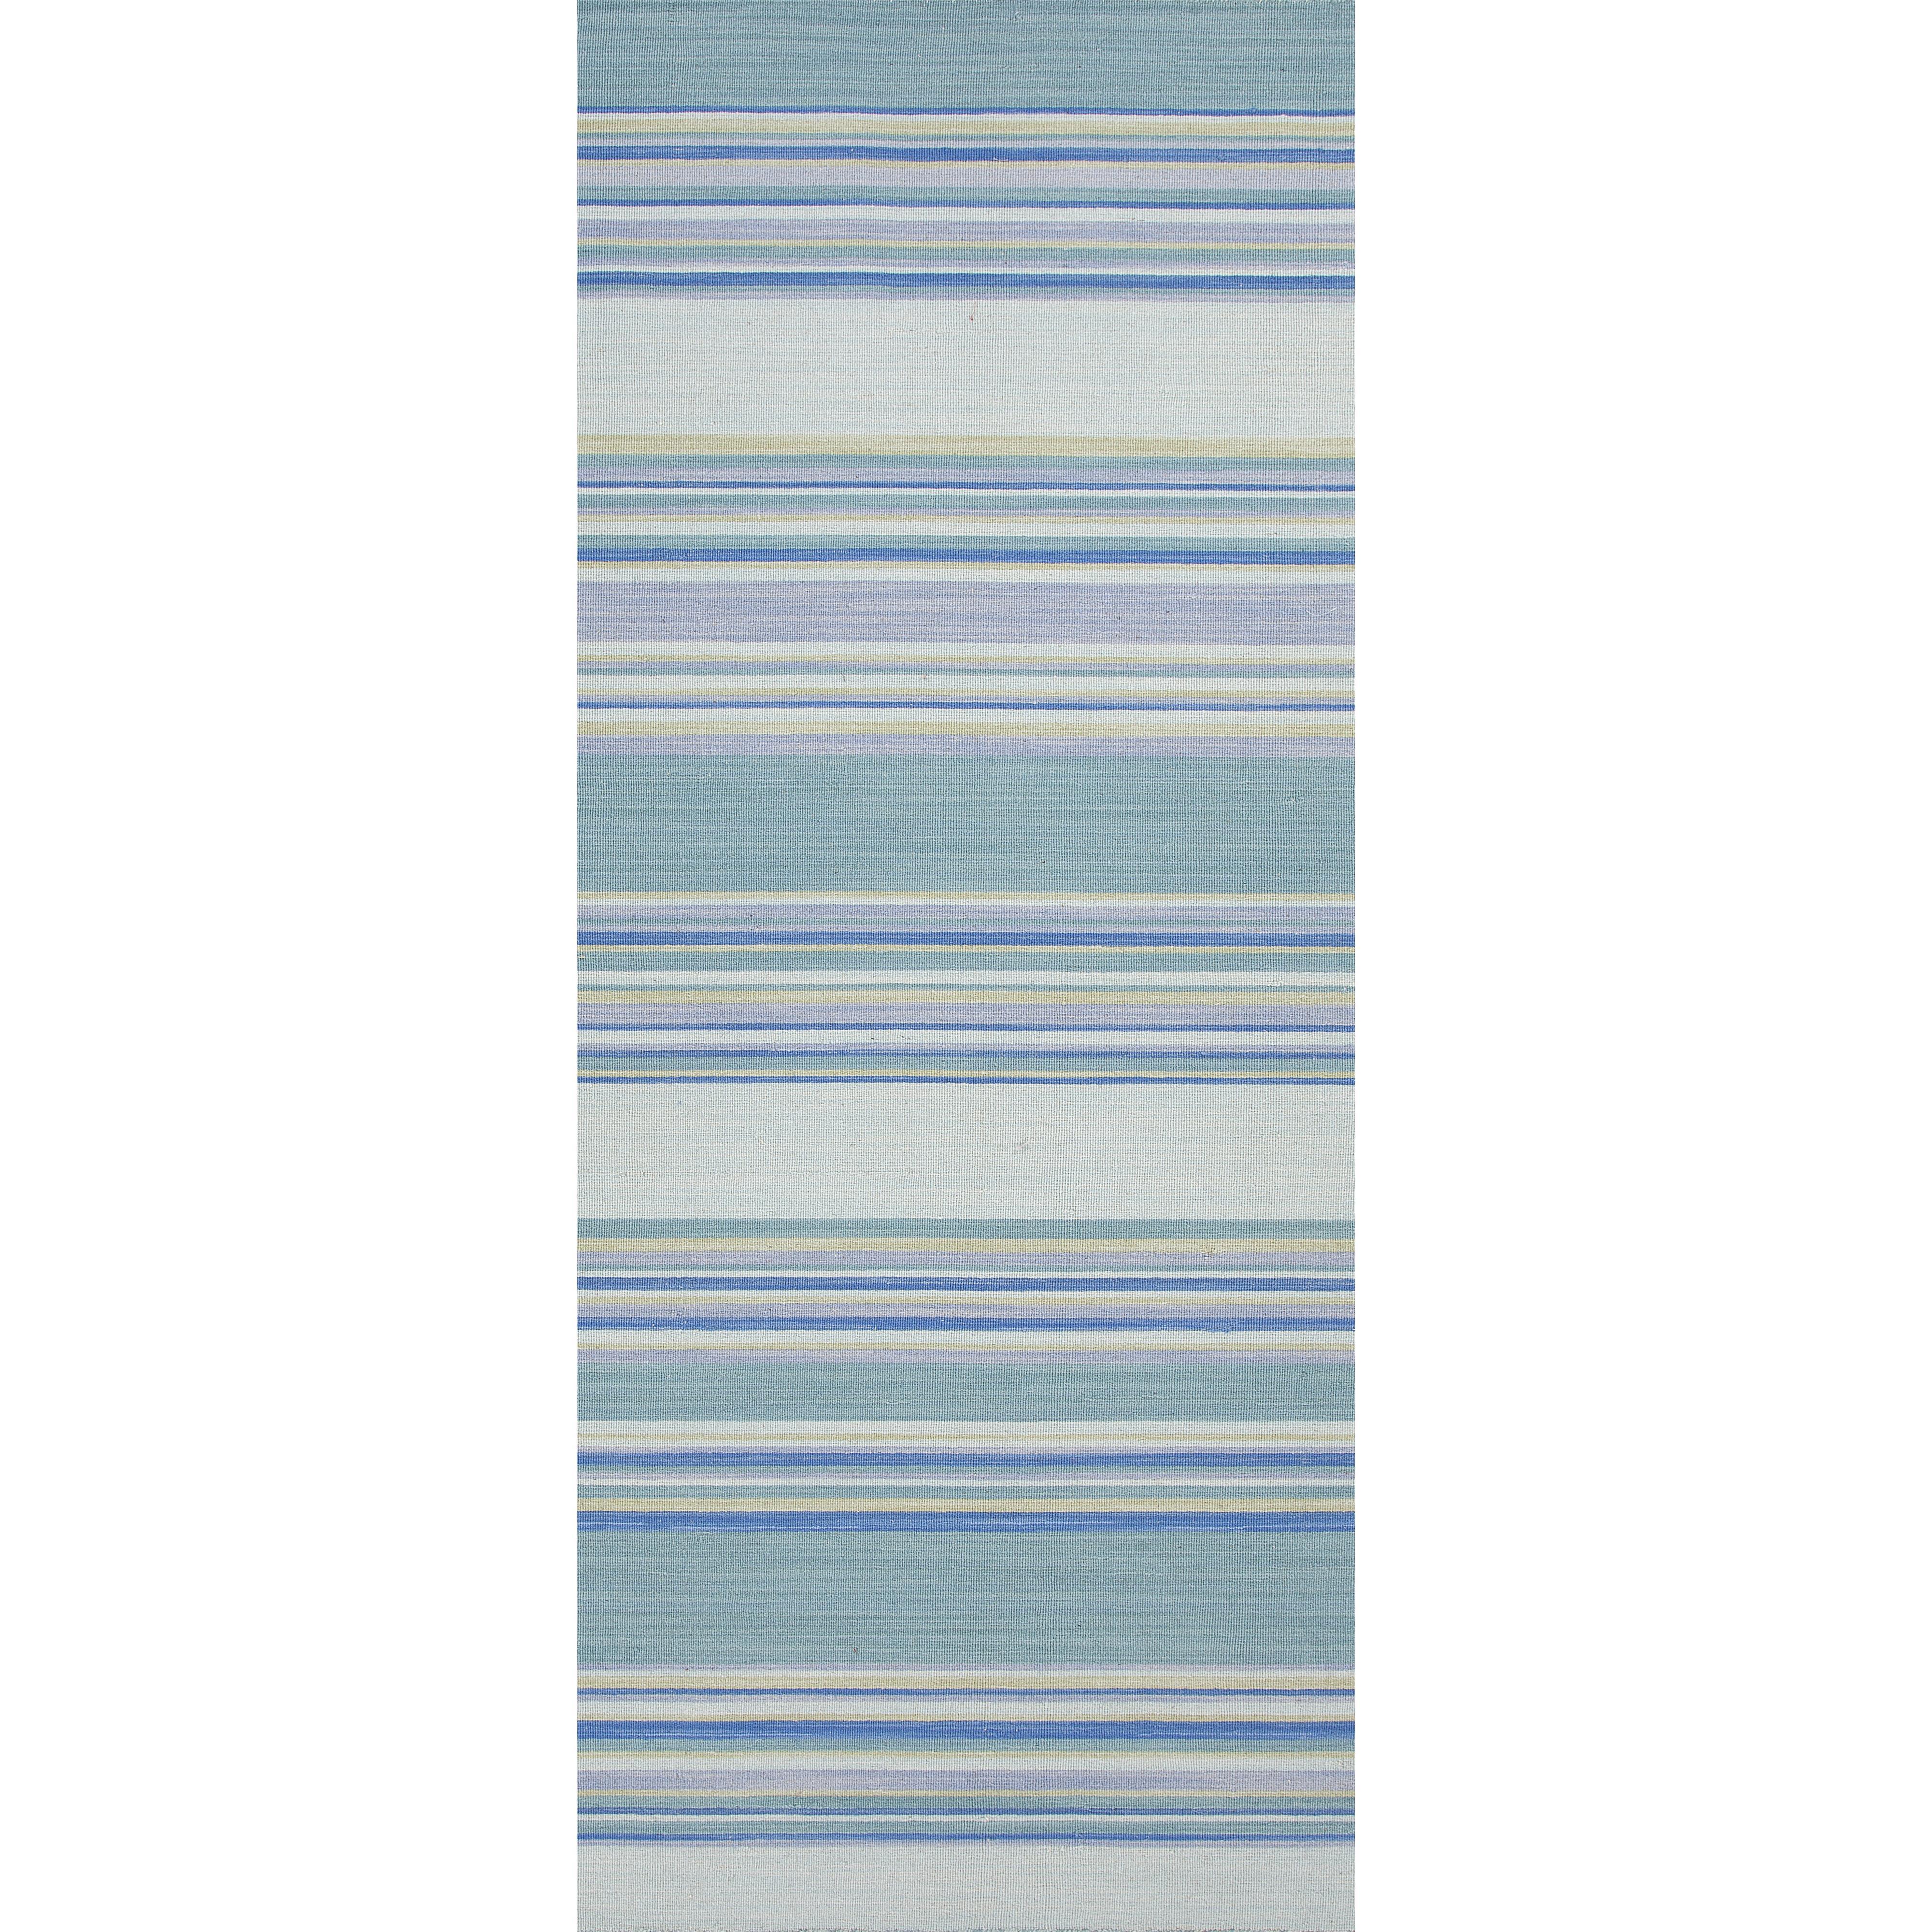 JAIPUR Rugs Coastal Shores 2.6 x 8 Rug - Item Number: RUG122442